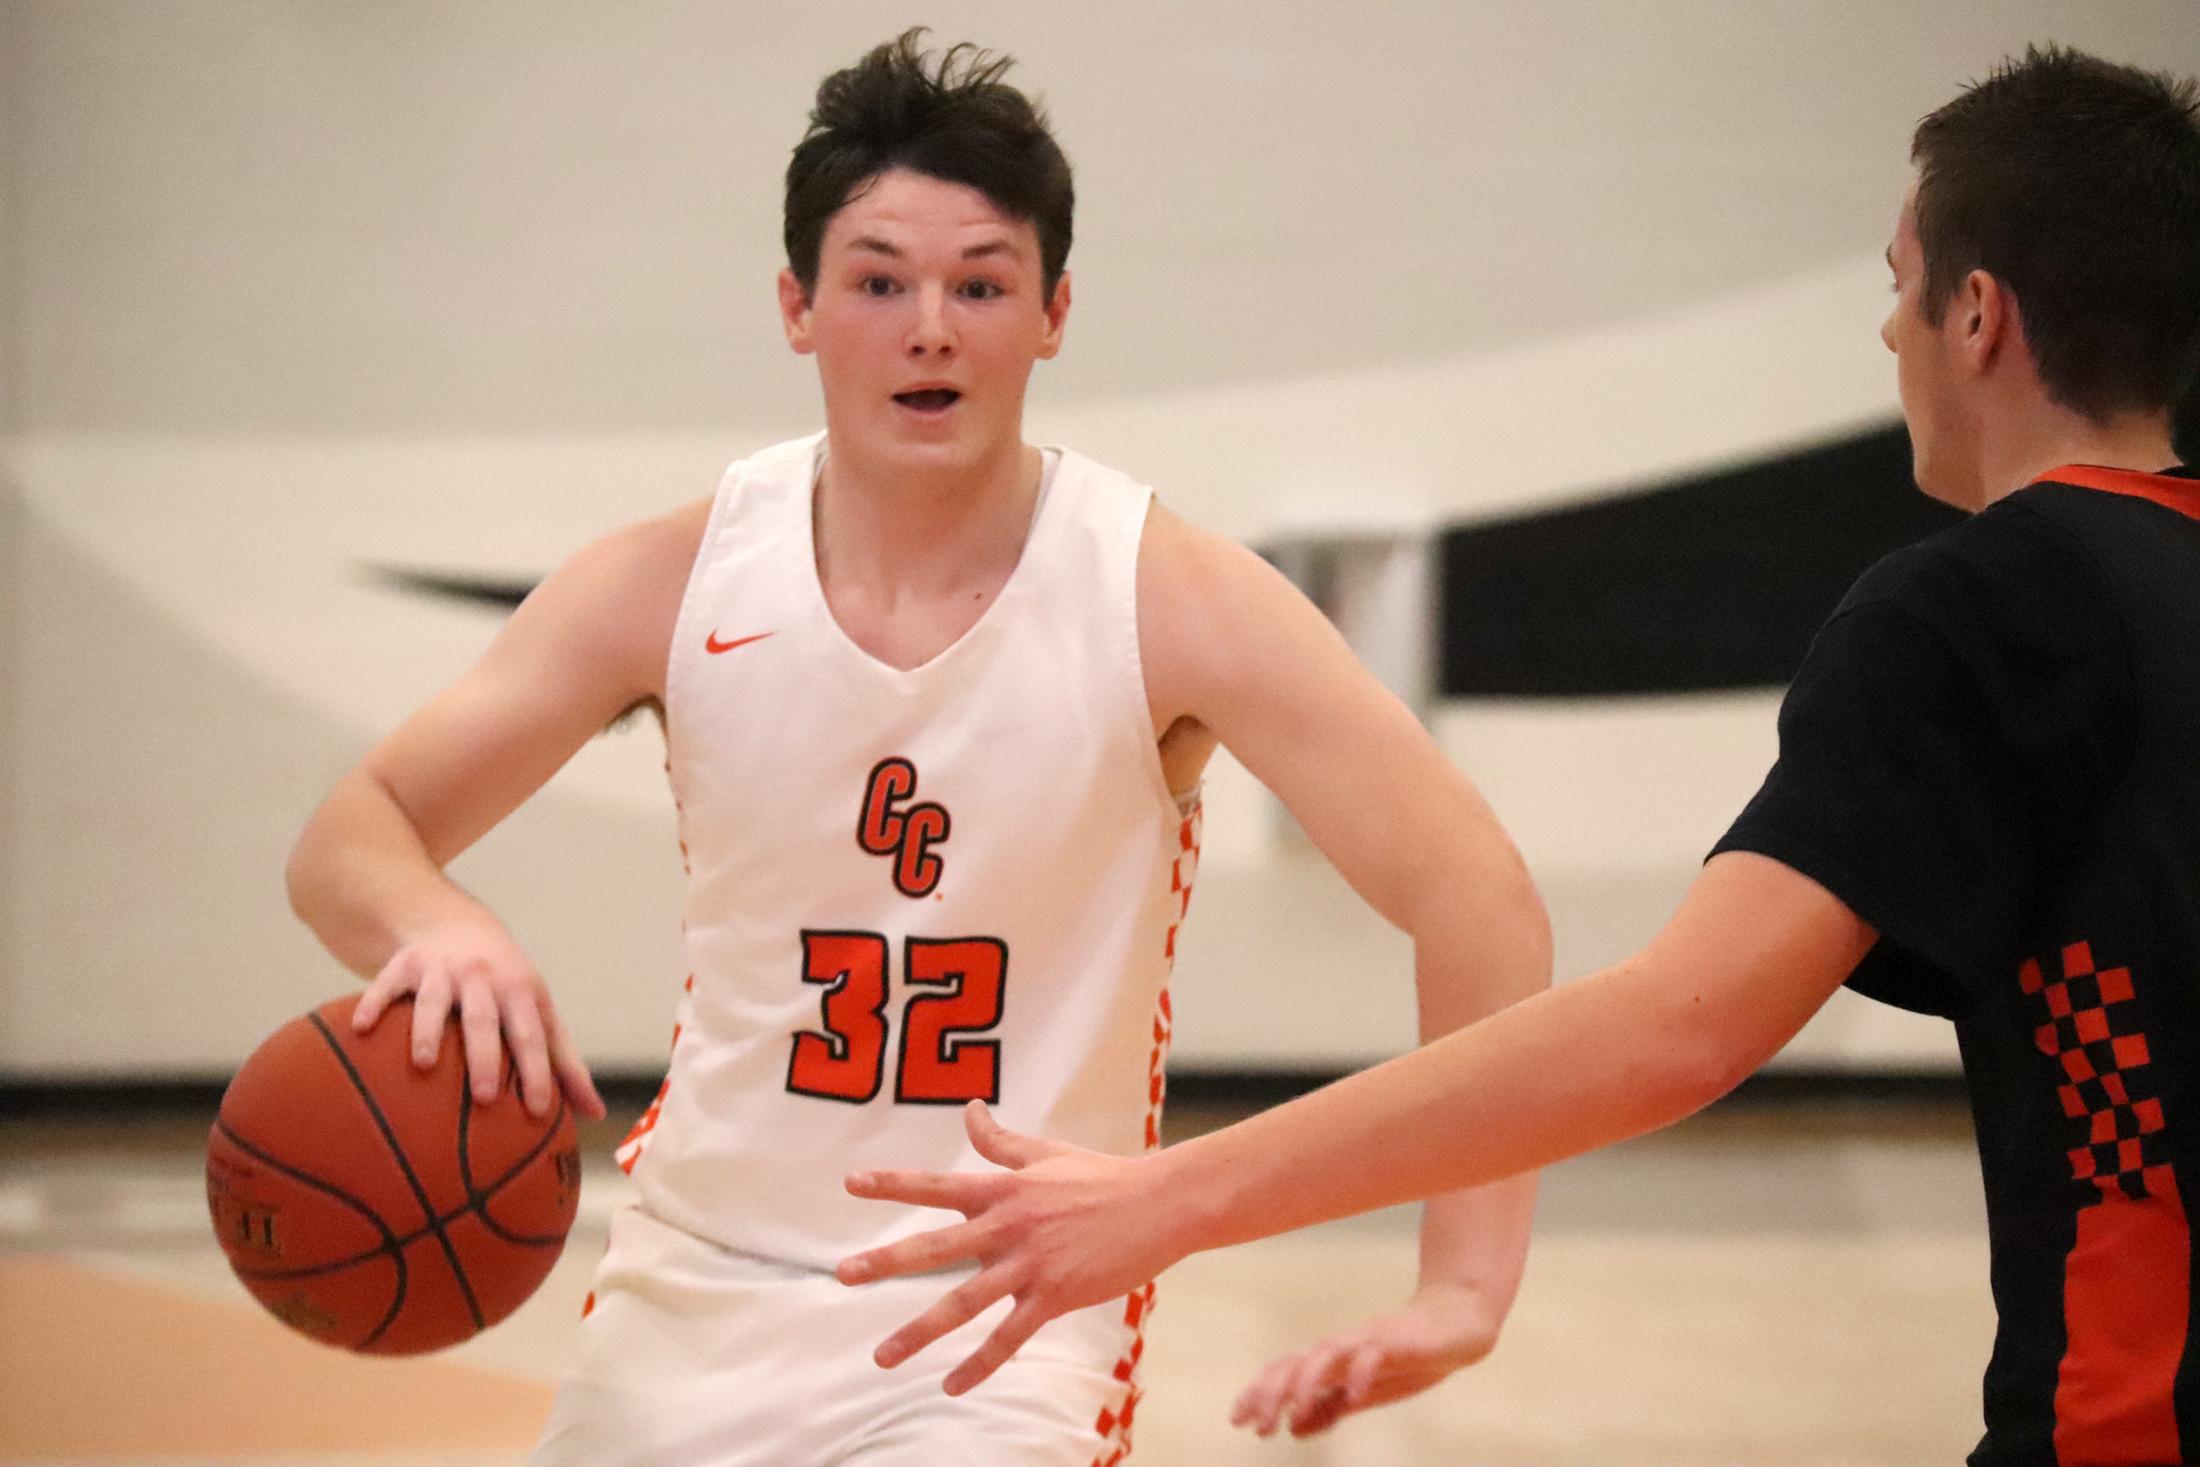 Comet senior Kaden Barry named All-NEIC Boys Basketball Honorable Mention